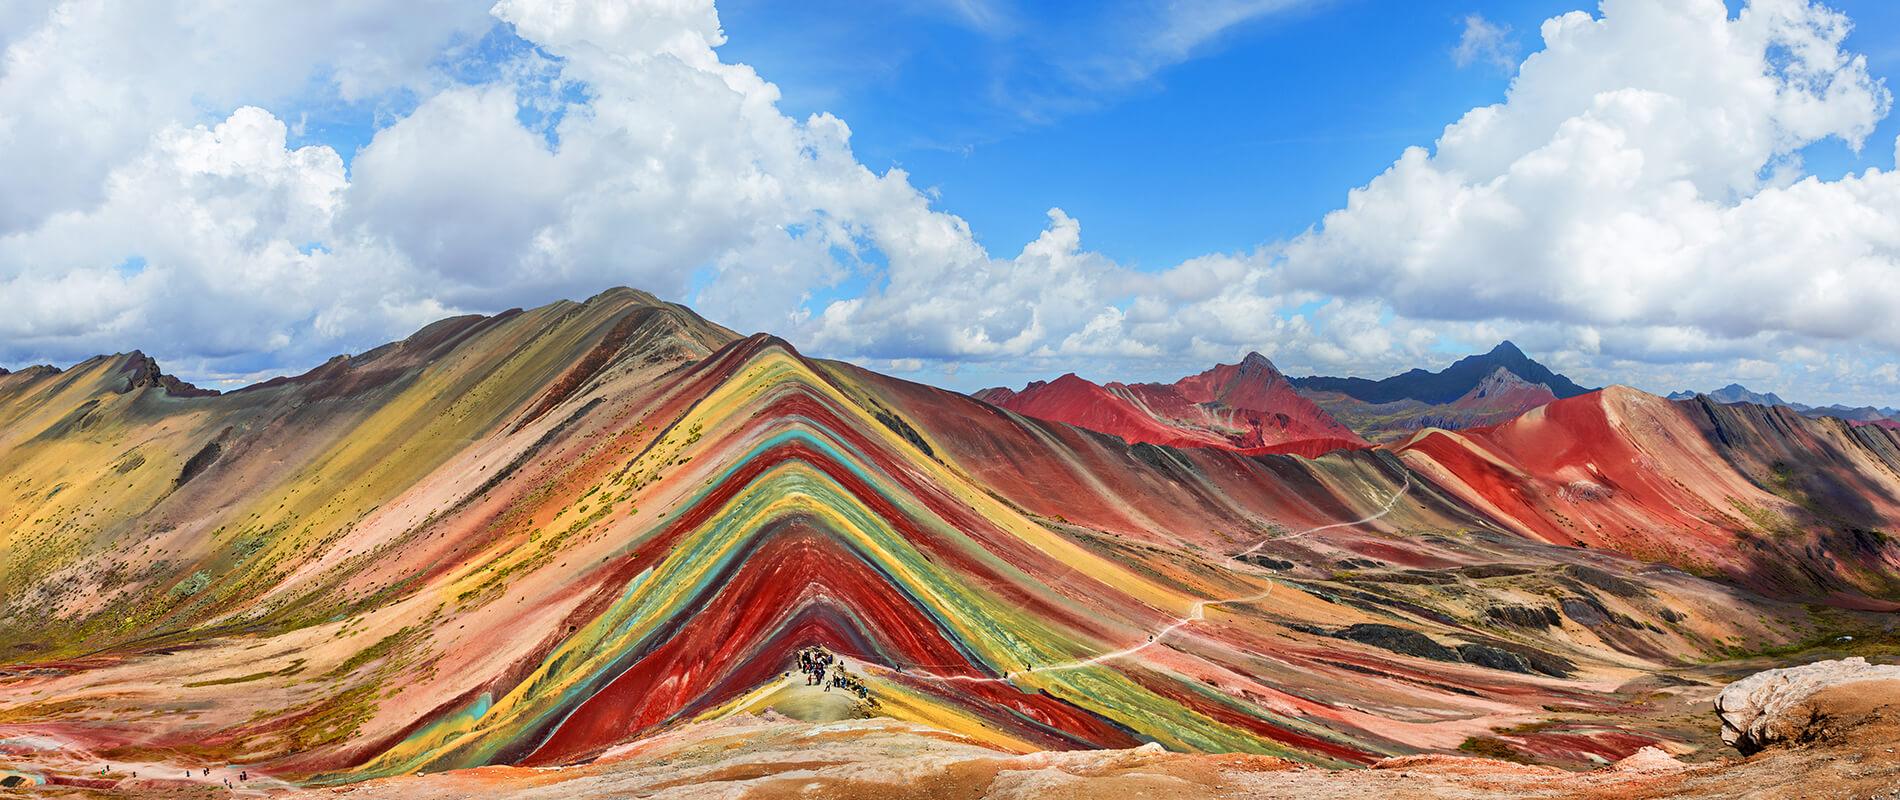 vinicunca rainbow mountain image